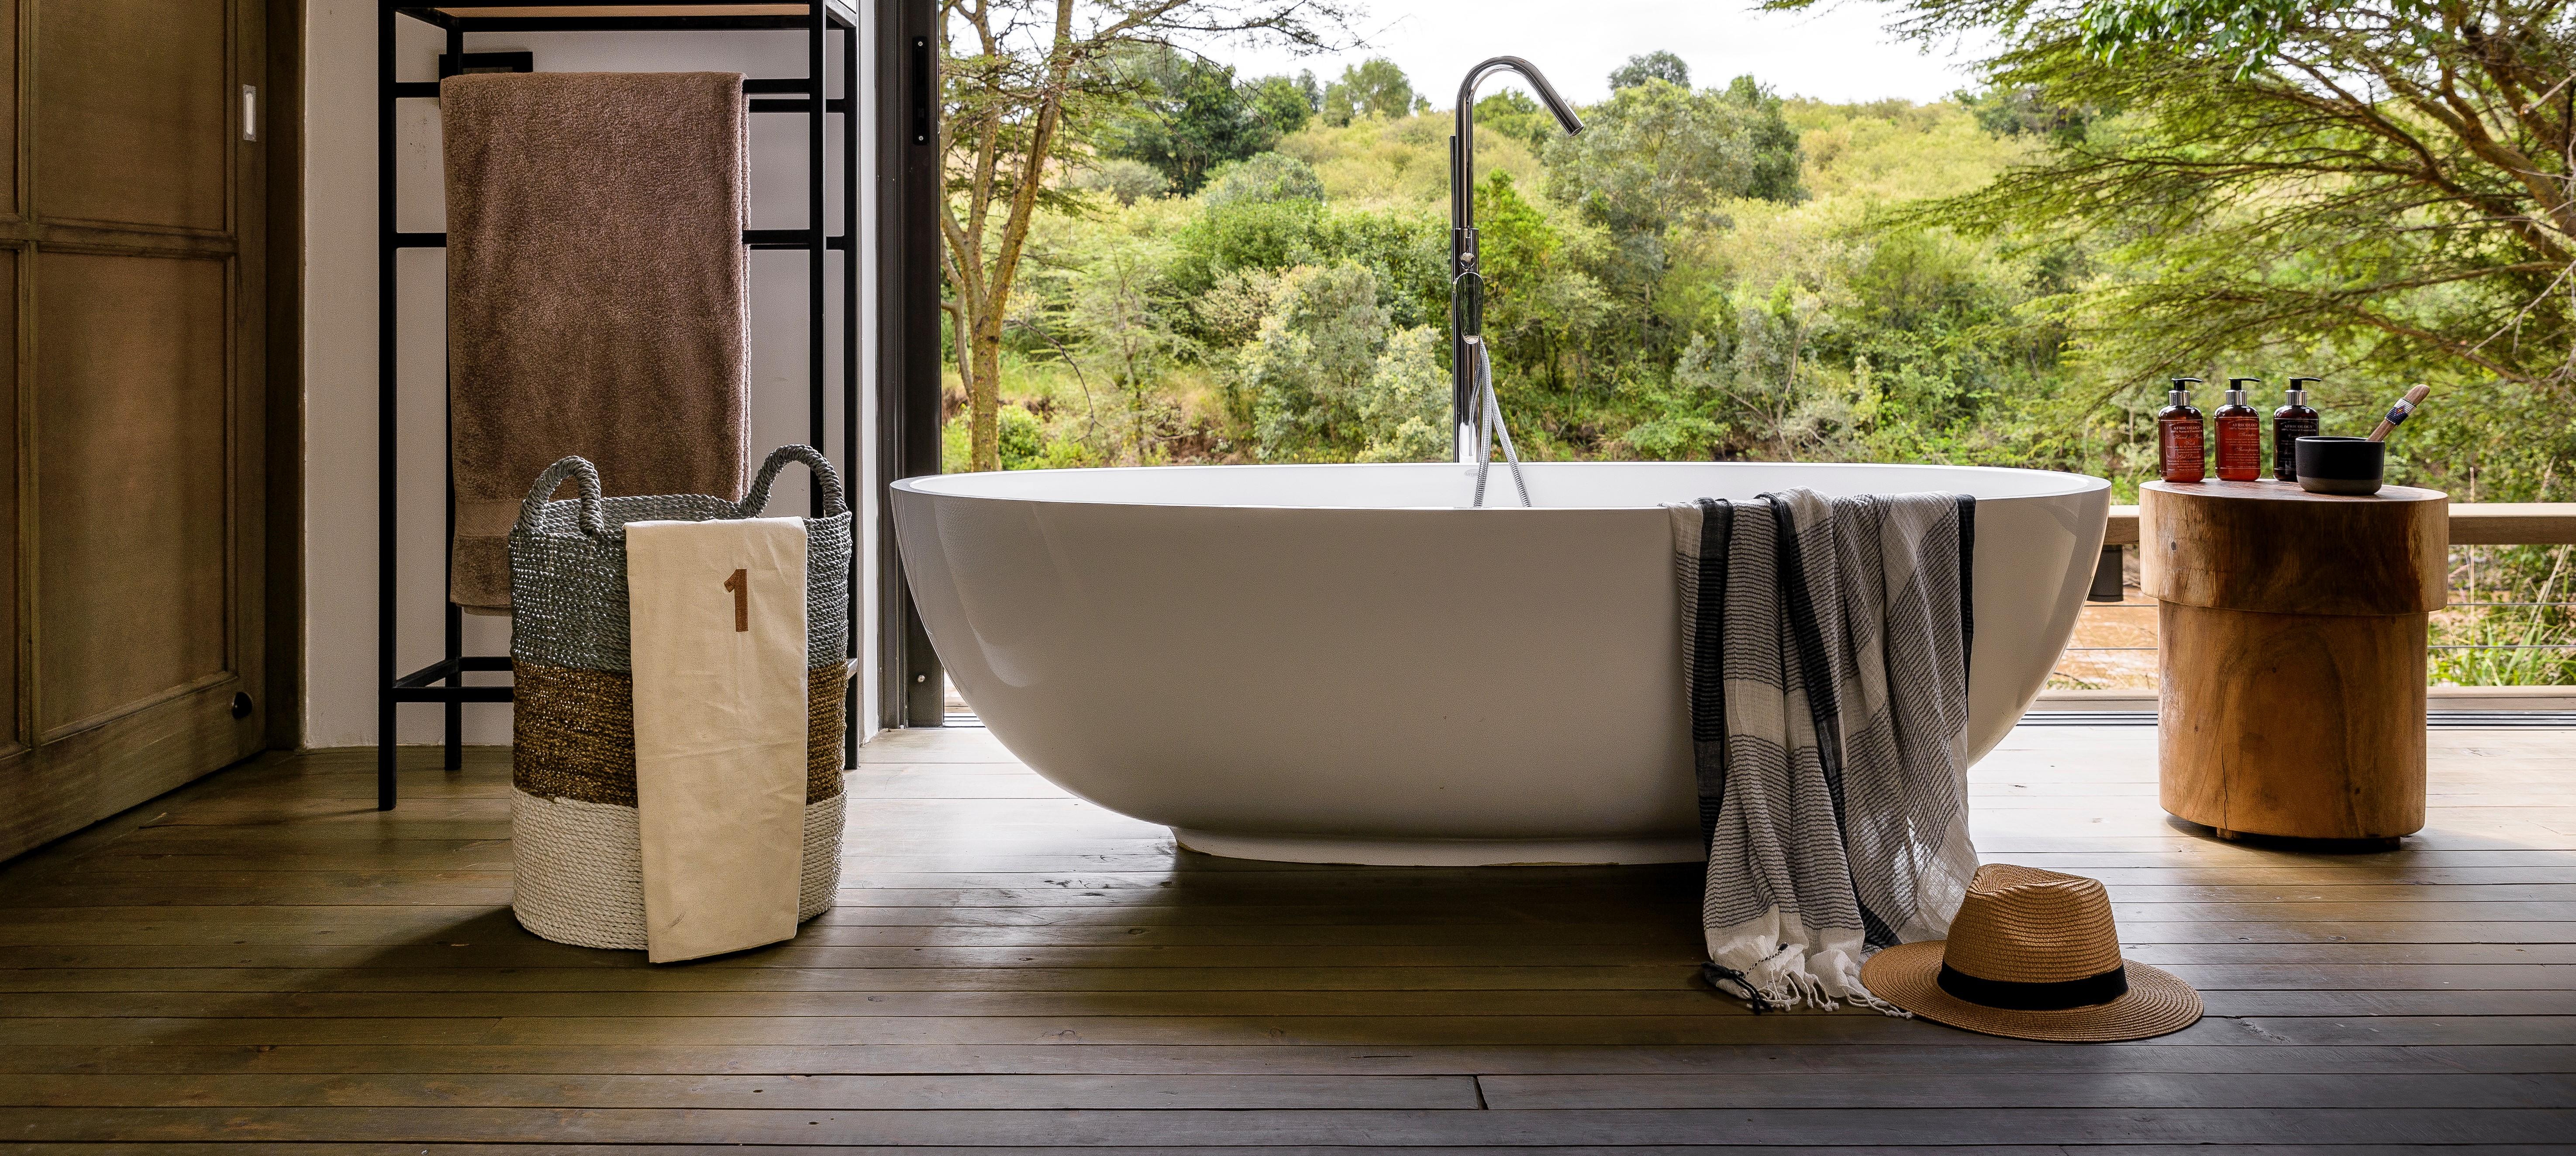 sanctuary-olonana-luxury-bathroom